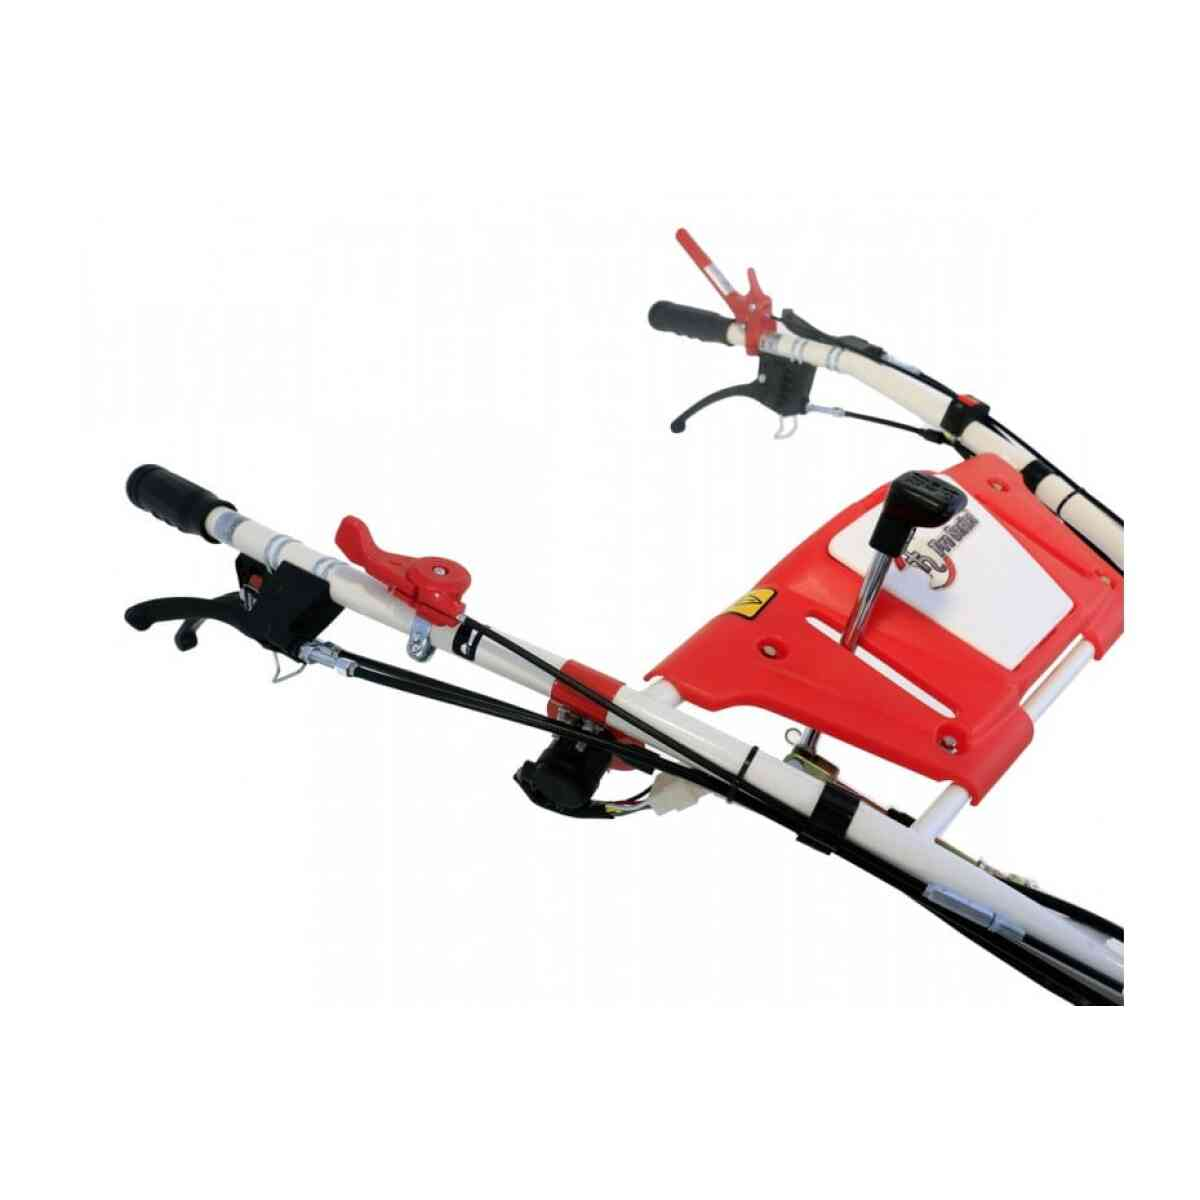 motocultor pro series new 1350 s o mac.ro 12 1 88